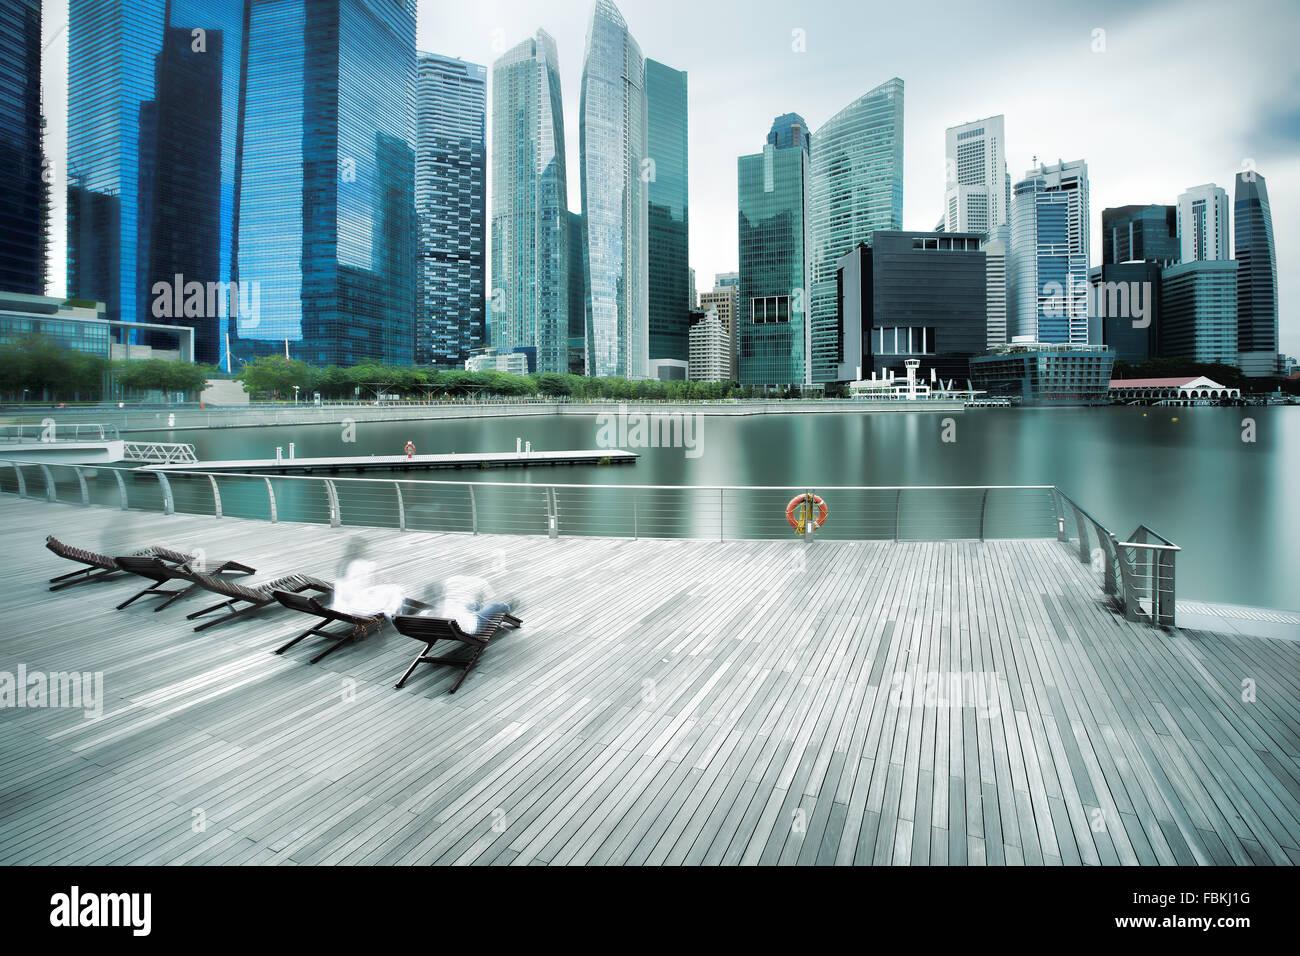 Backlit city skyline - Stock Image